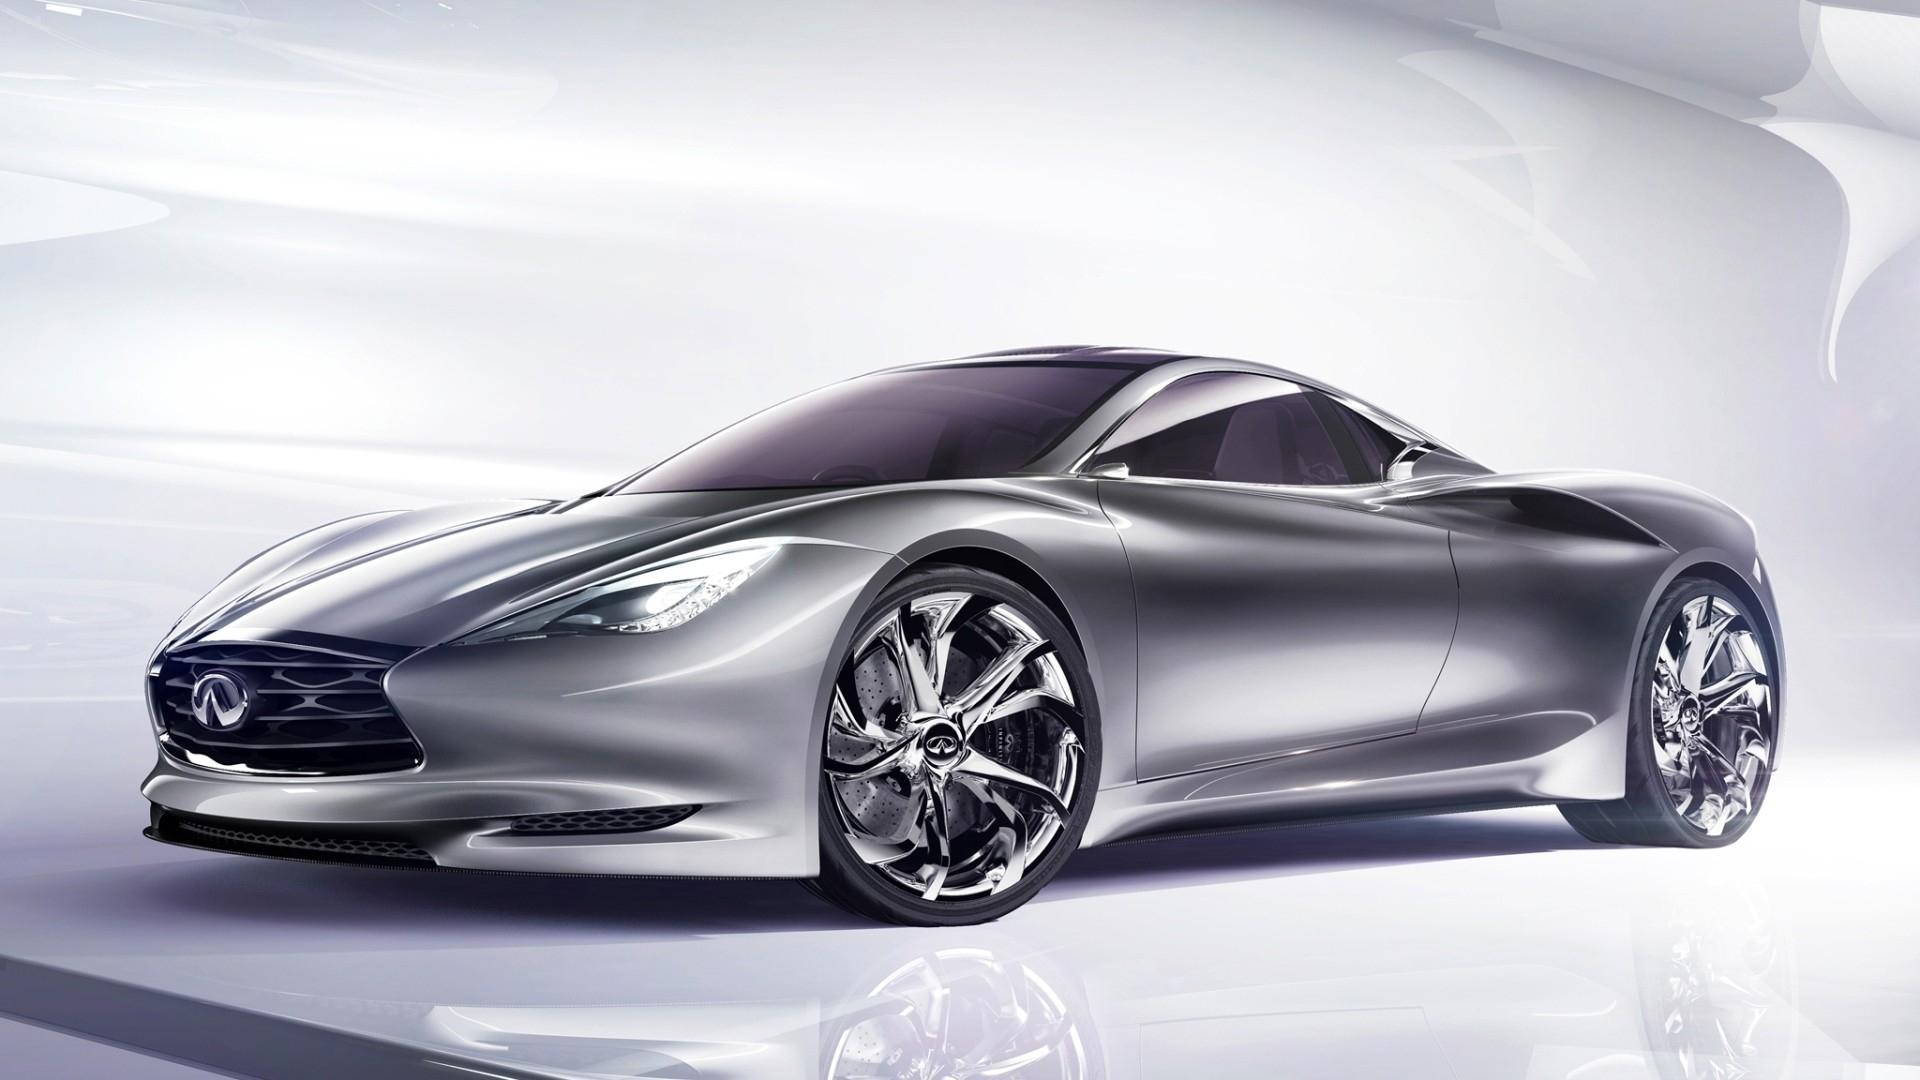 gray infiniti emerg e concept sport car. Black Bedroom Furniture Sets. Home Design Ideas